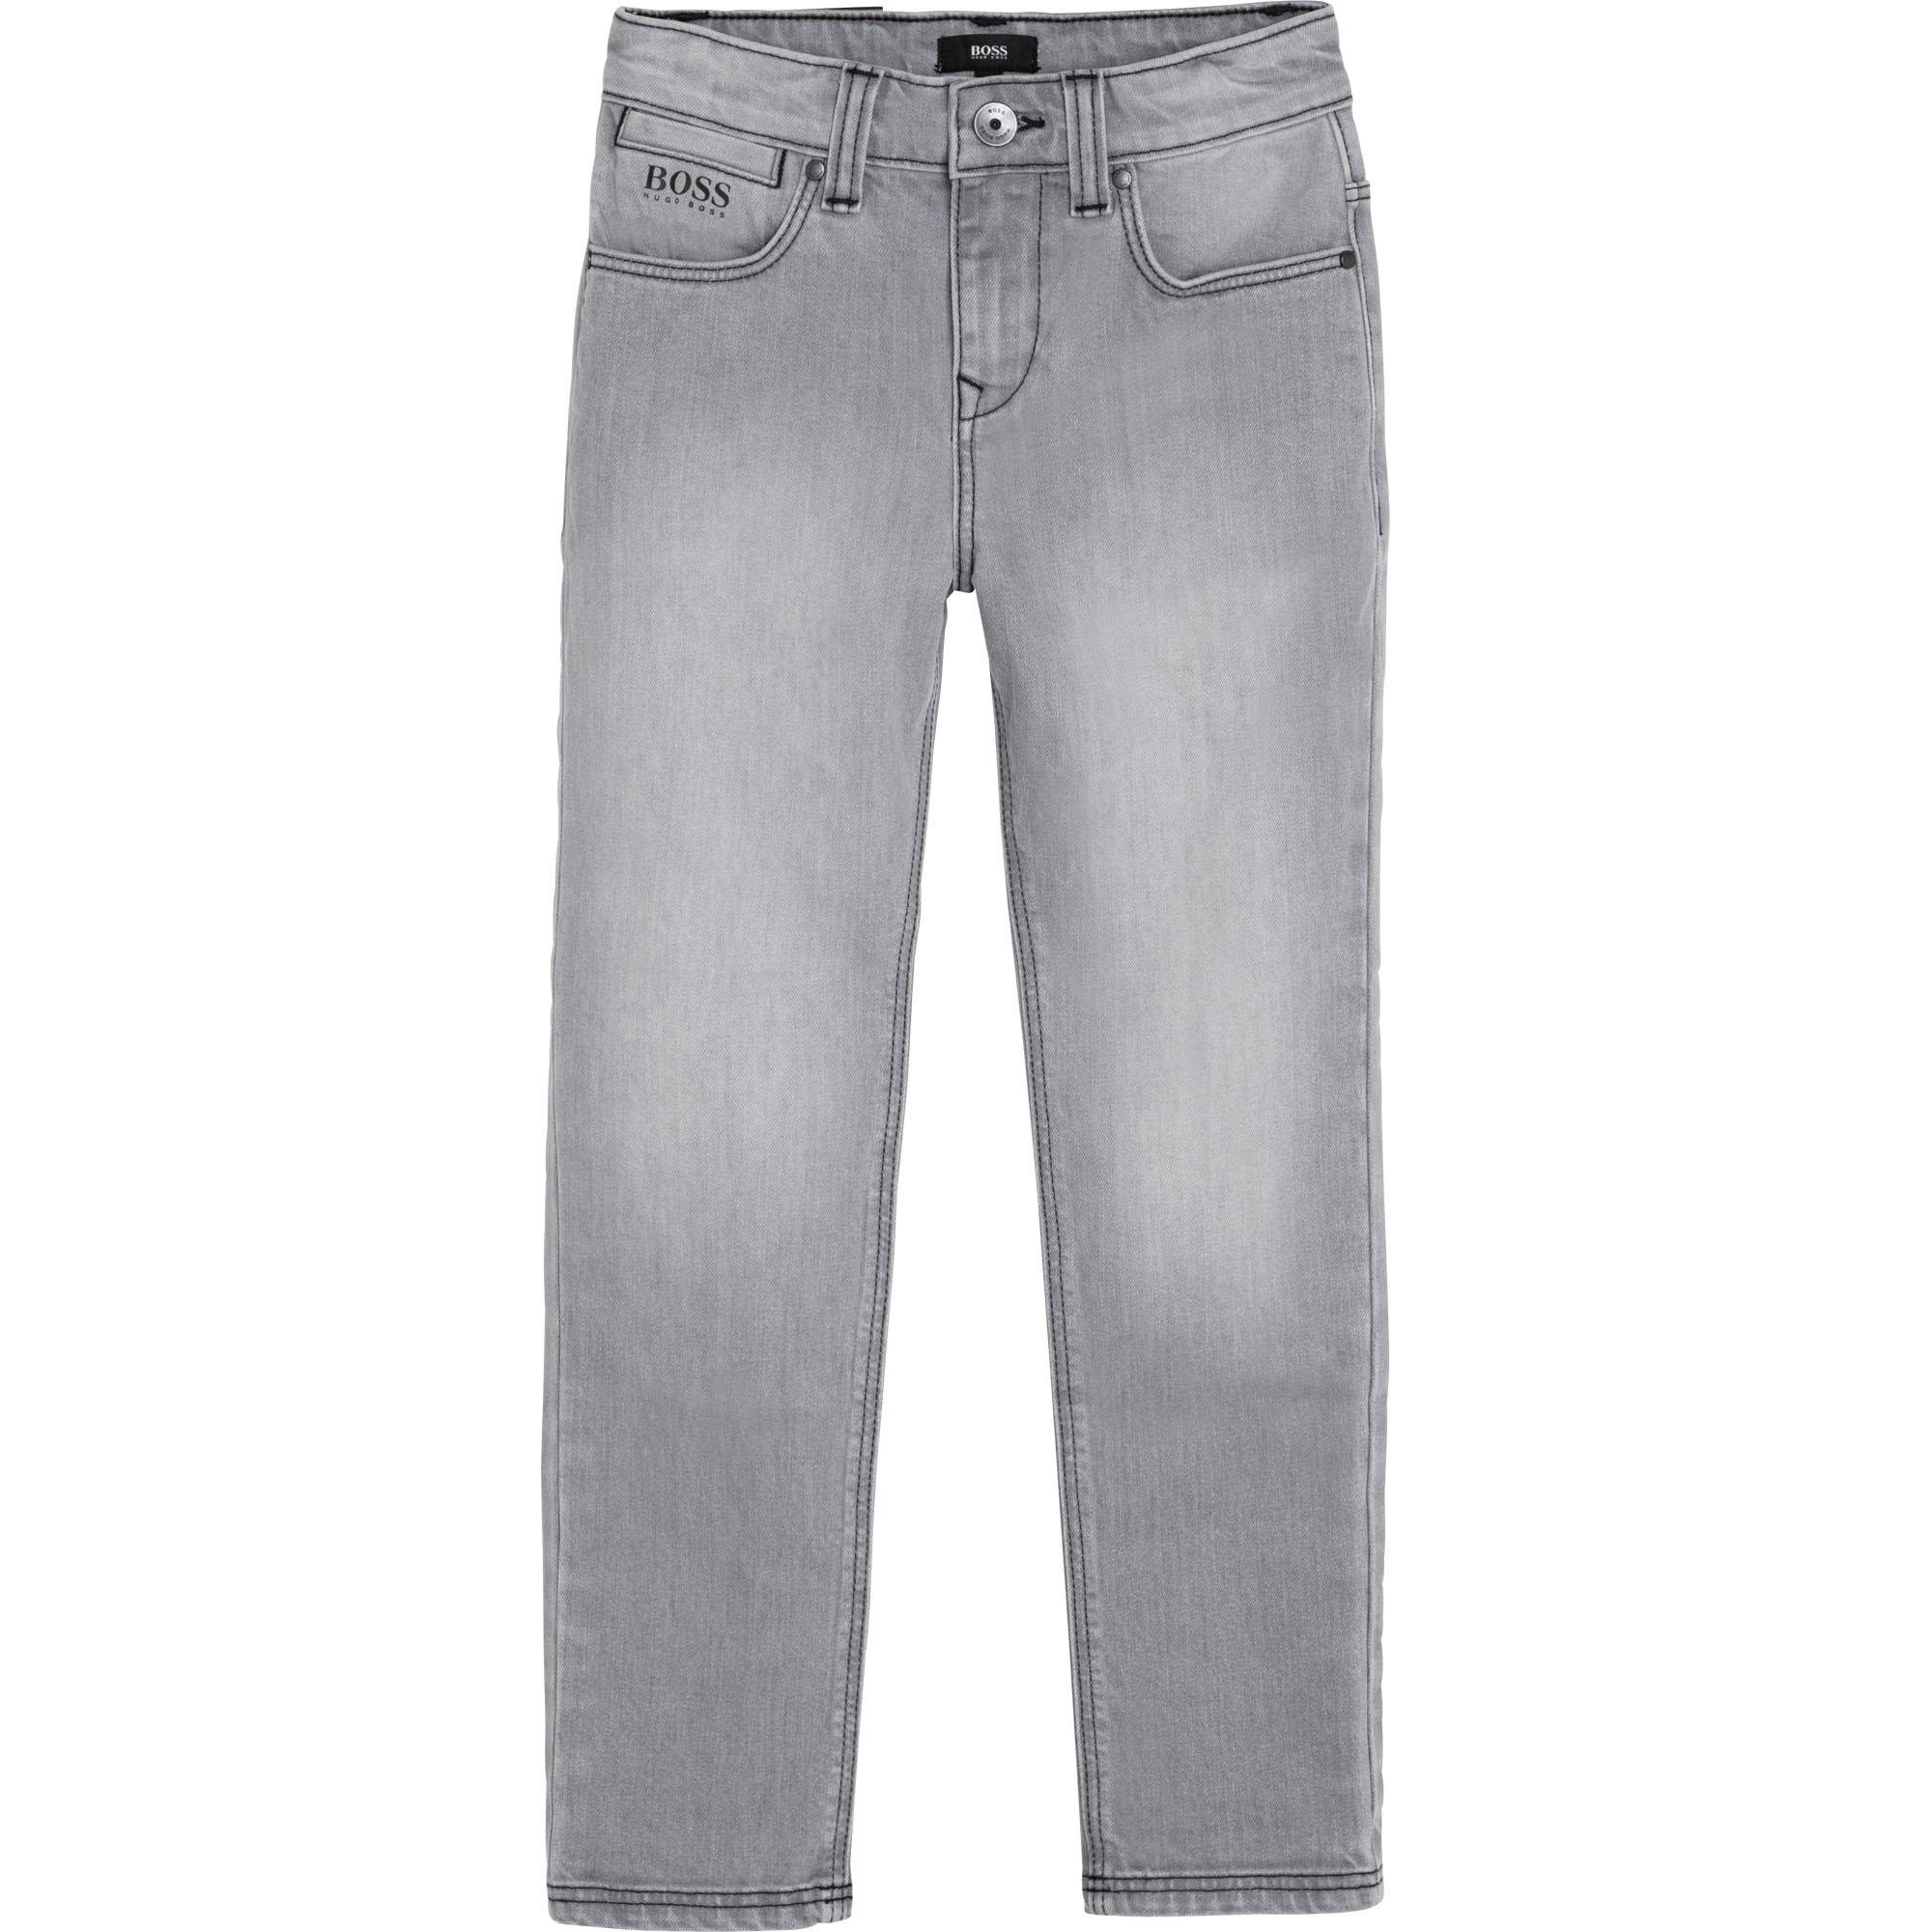 Slim fit denim jeans BOSS for BOY